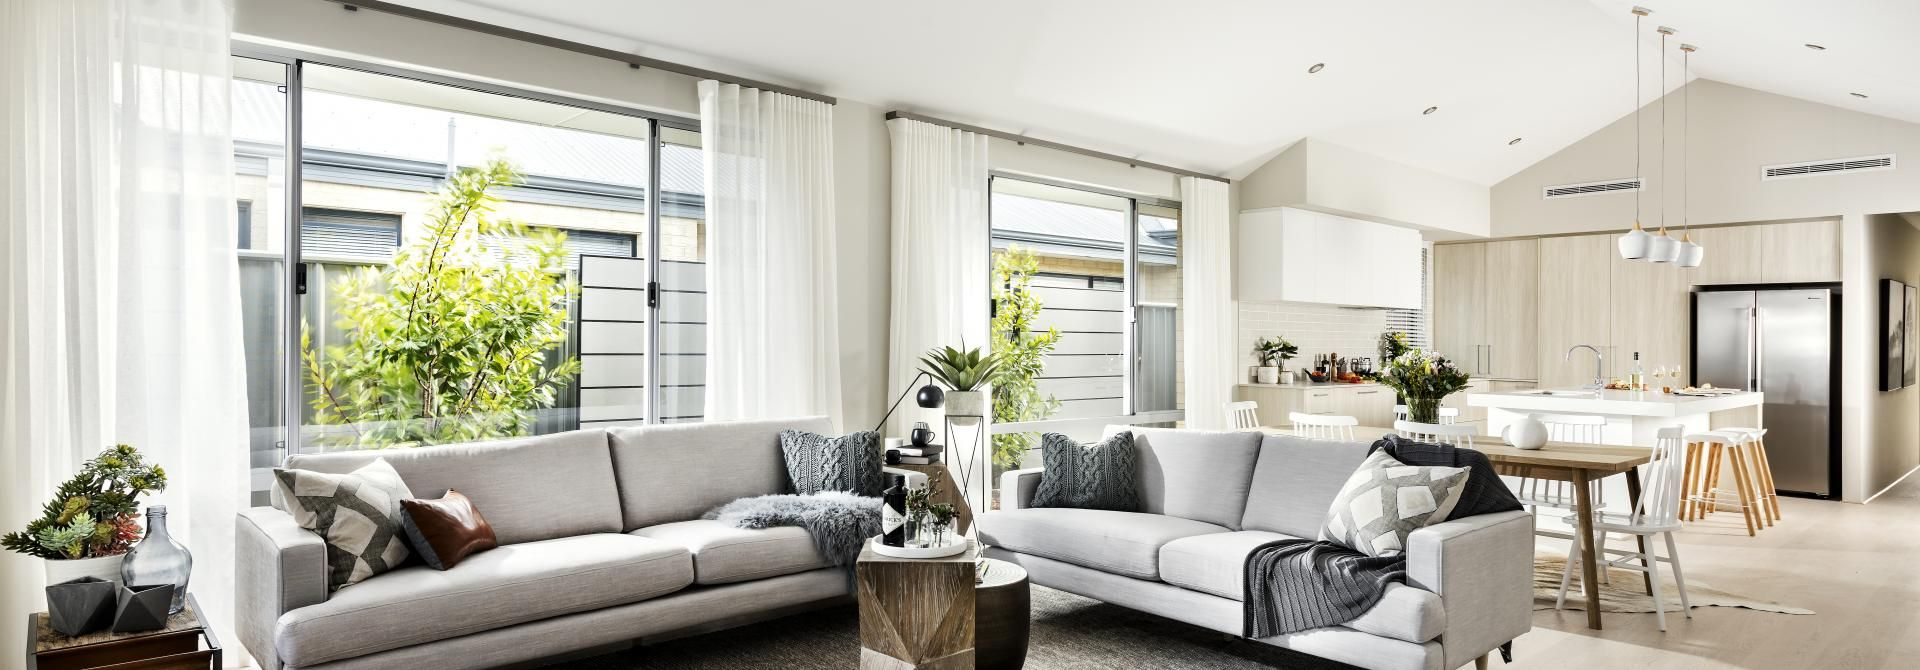 New Home Design Perth Odin I Dale Alcock Homes With